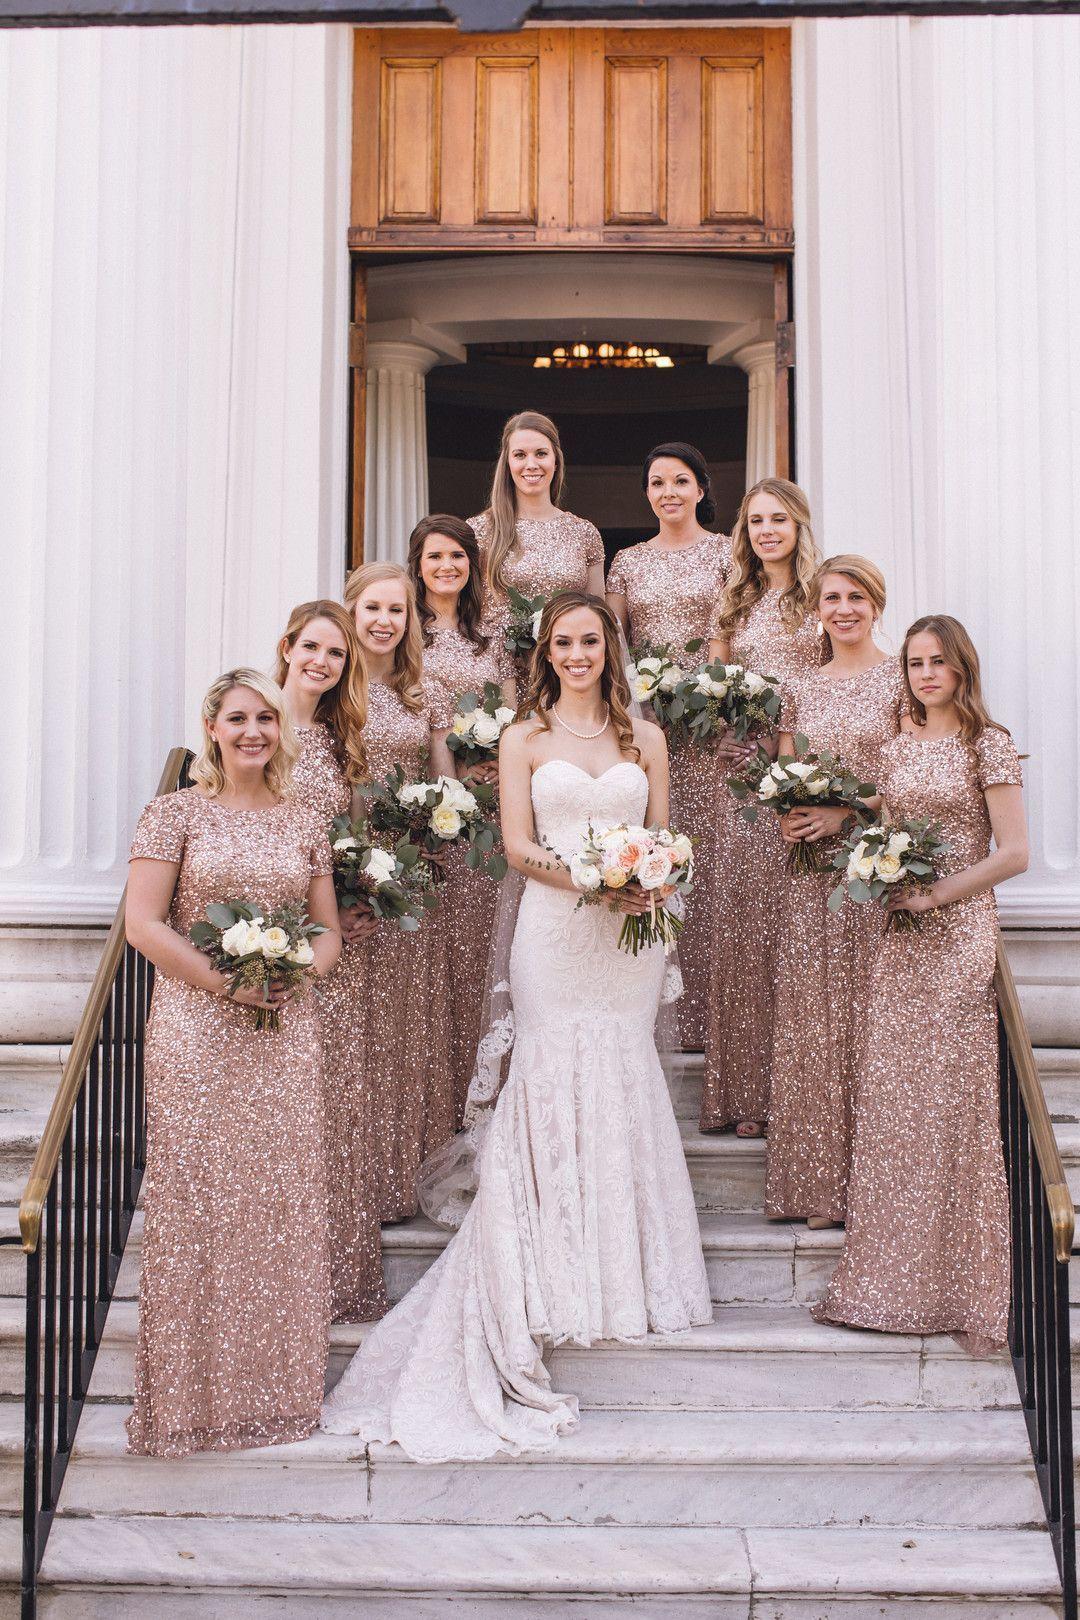 Black Tie Wedding In Charleston South Carolina Photo By Richard Bell Ph Beach Style Wedding Dresses Rose Gold Wedding Bridesmaids Wedding Bridesmaid Dresses